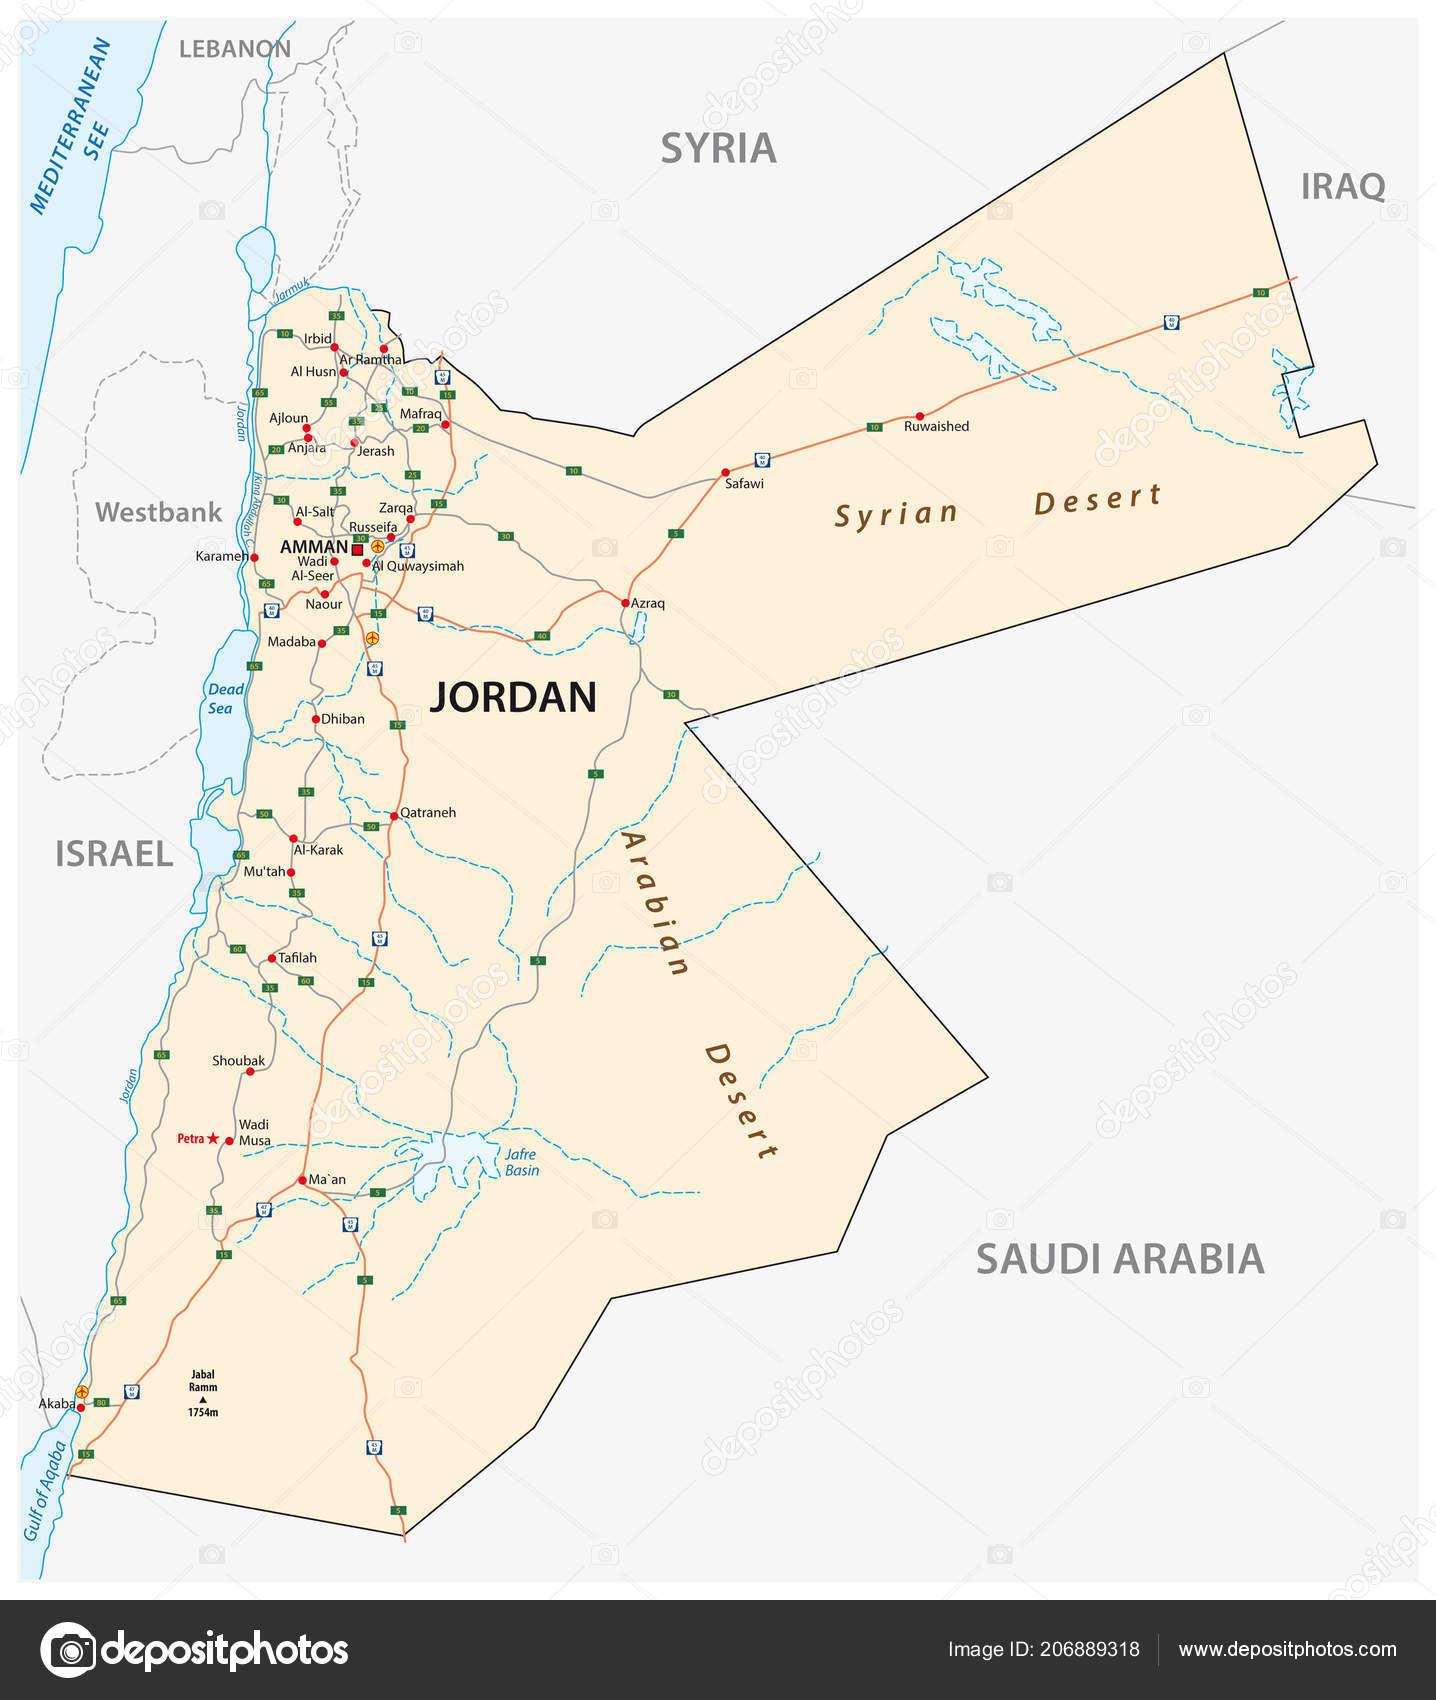 Kingdom Of Jordan Map on saudi arabia map, united kingdom map, people's republic of korea map, brazil map, kingdom of moab, papua new guinea map, aqaba jordan map, antigua and barbuda map, hong kong map, the bahamas map, republic of nauru map, iran map, india map, moldova map, united arab emirates map, jordan geography map, amman-jordan map, bermuda map, french wine map,